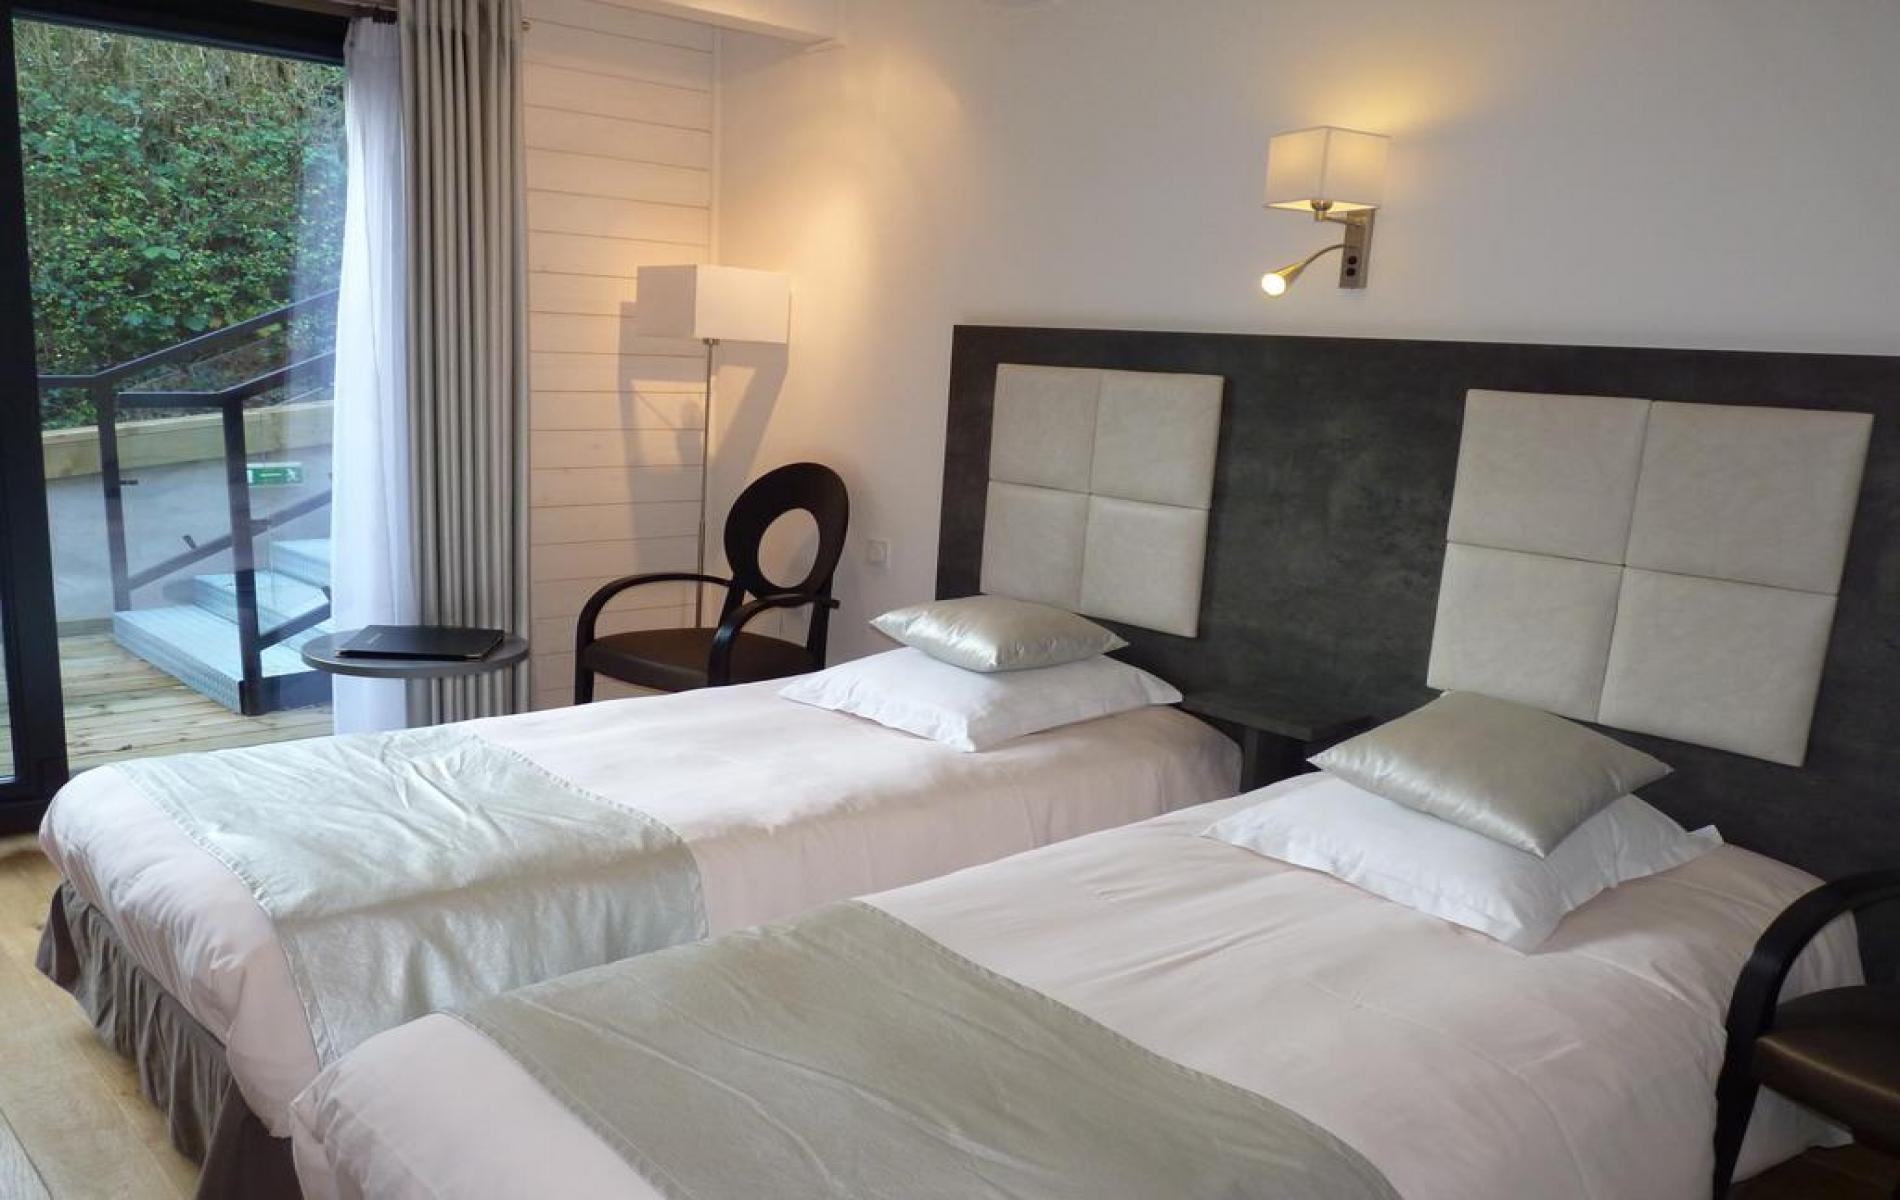 Hotel Chambres Honfleur - Chambres Normandie - Chambres 3 étoiles ...